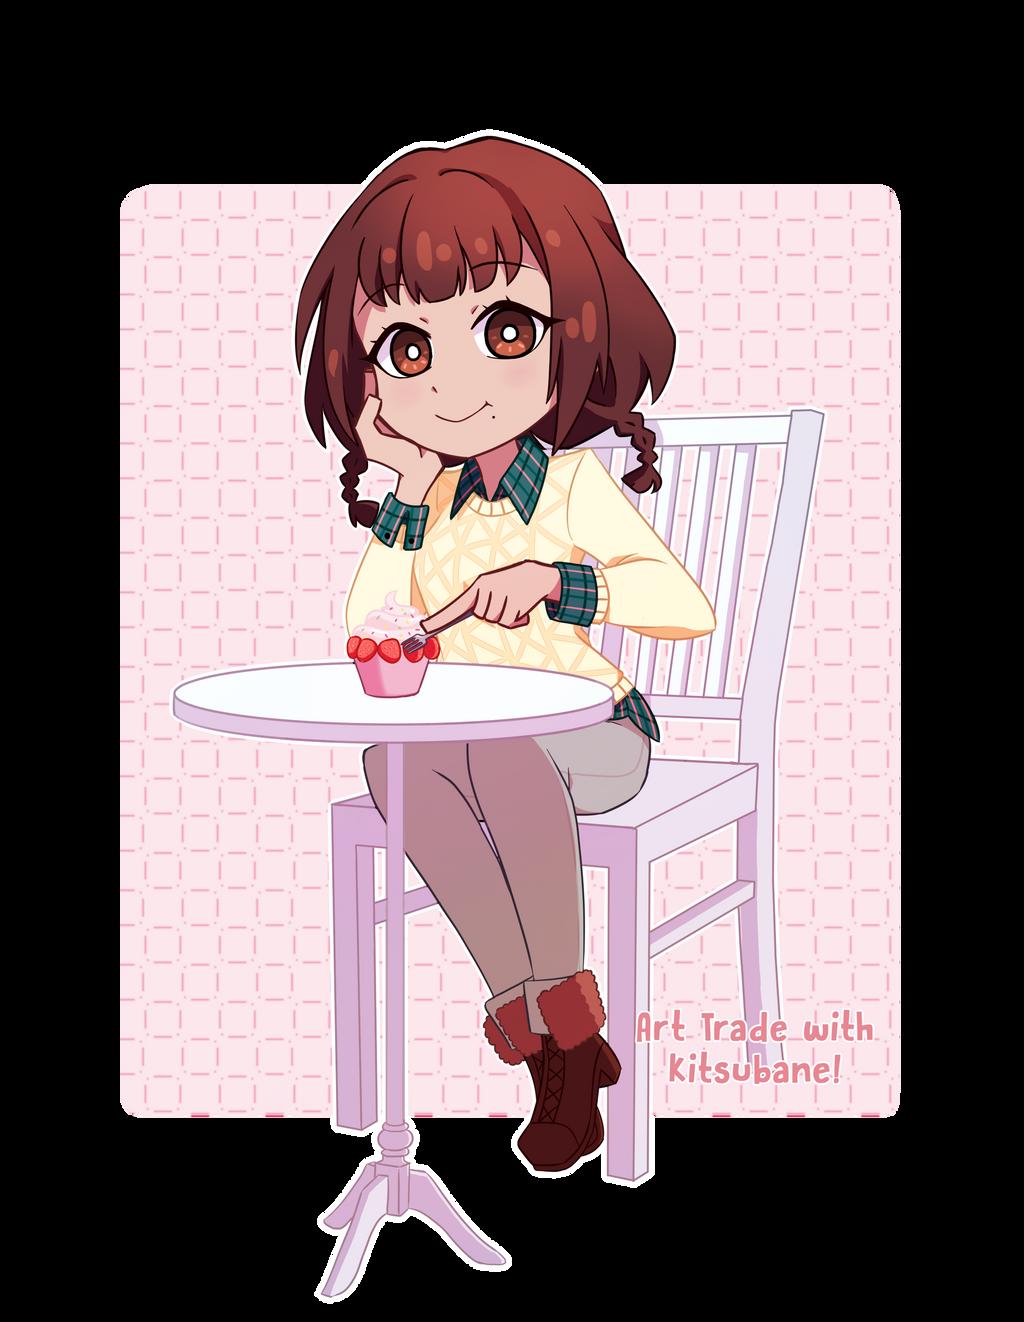 [Art Trade] Strawberries! by Piss-kun